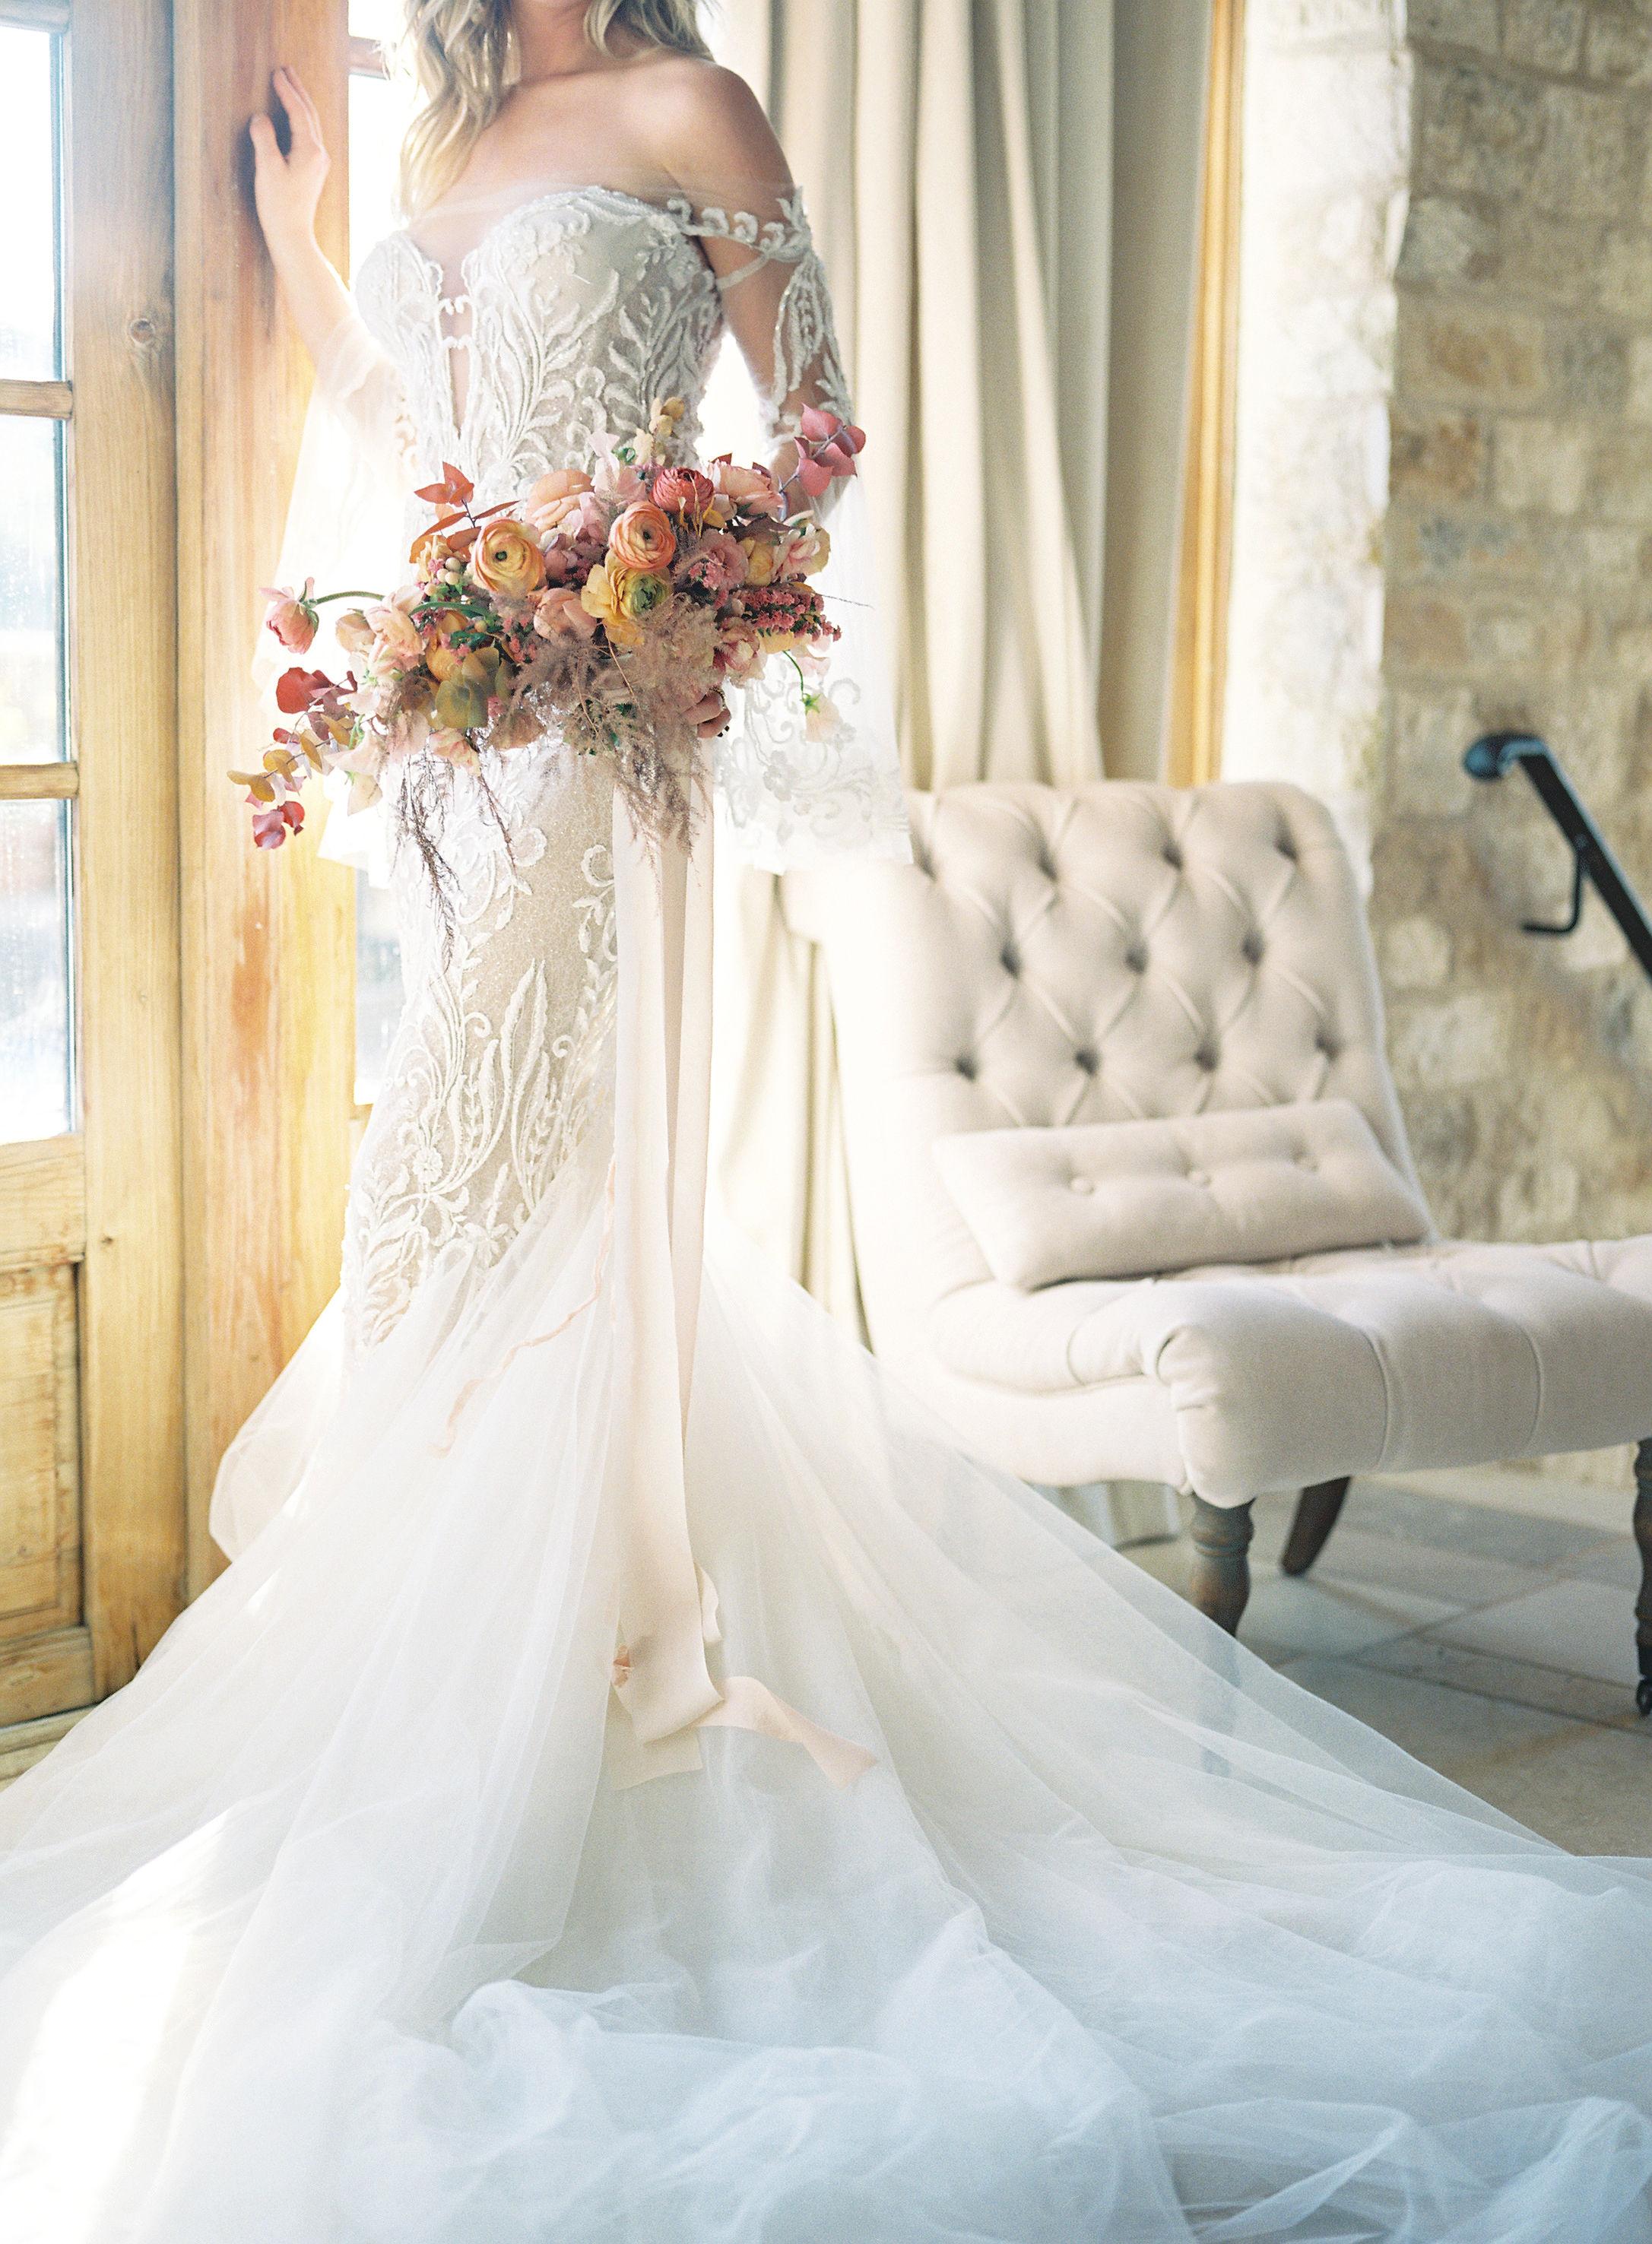 jessica-zimmerman-events-sunstone-bridal-bouquet-wedding.jpg